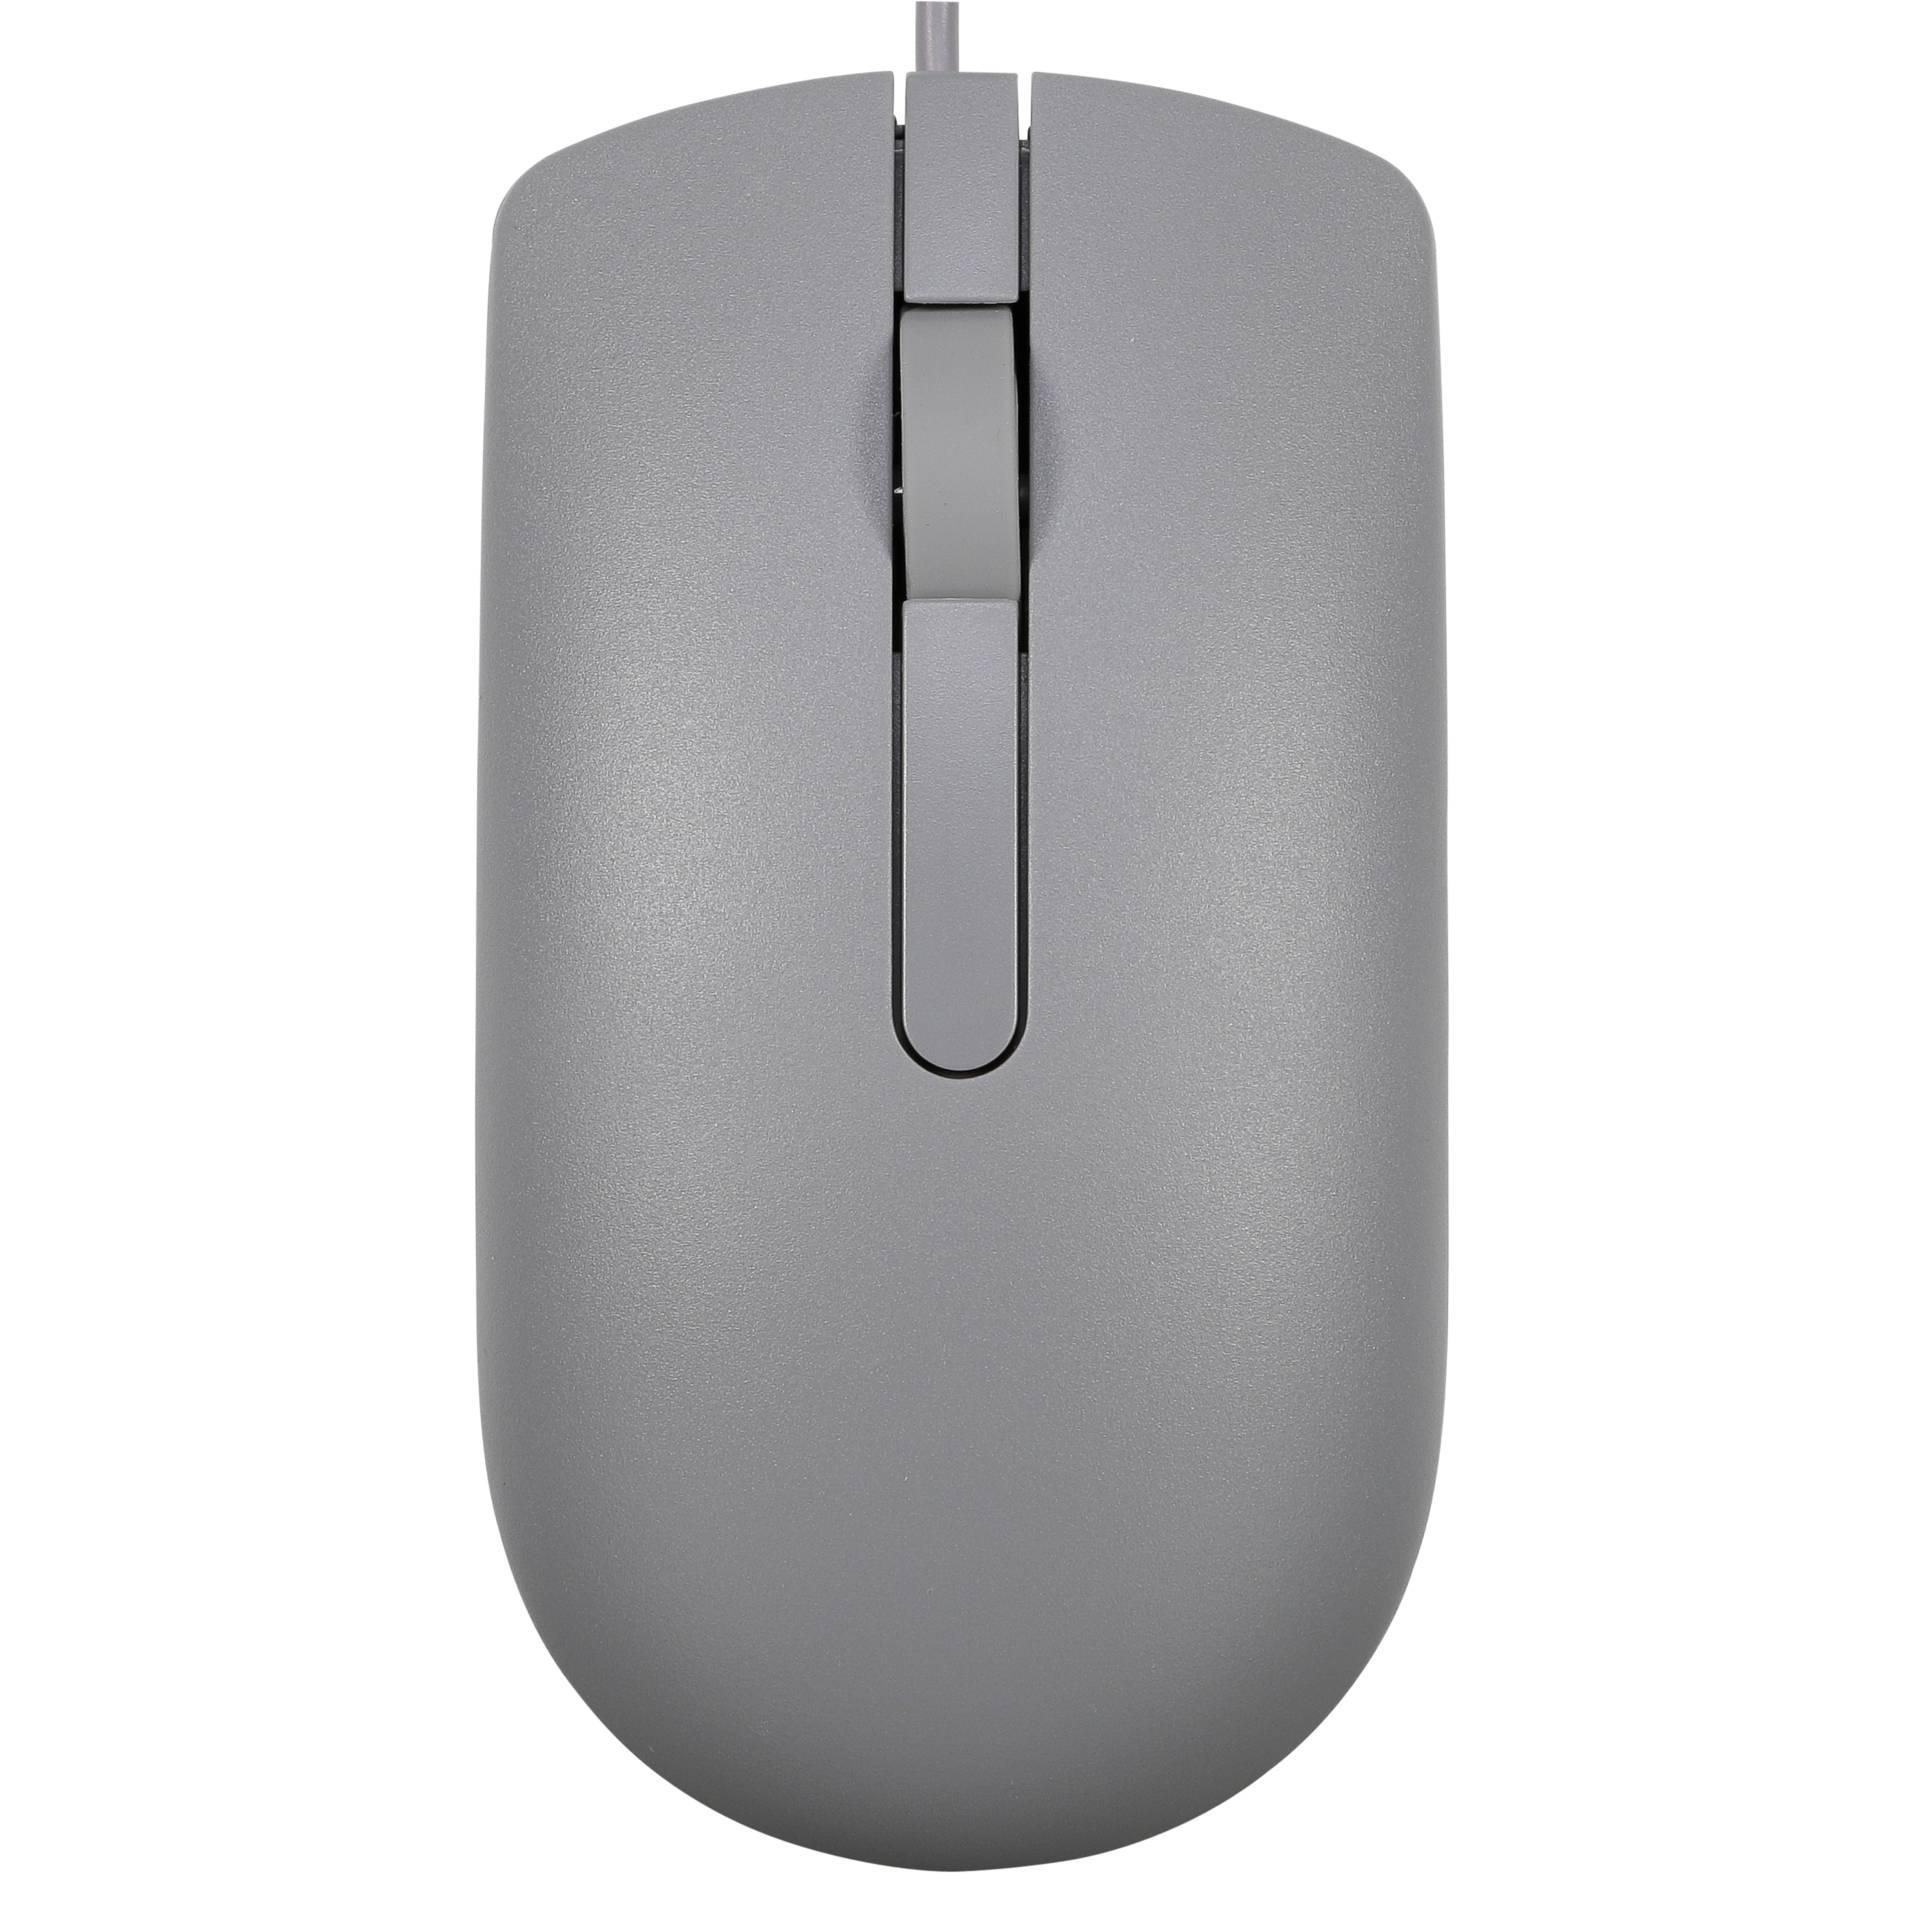 Dell Maus - Modell: MS116 Grau